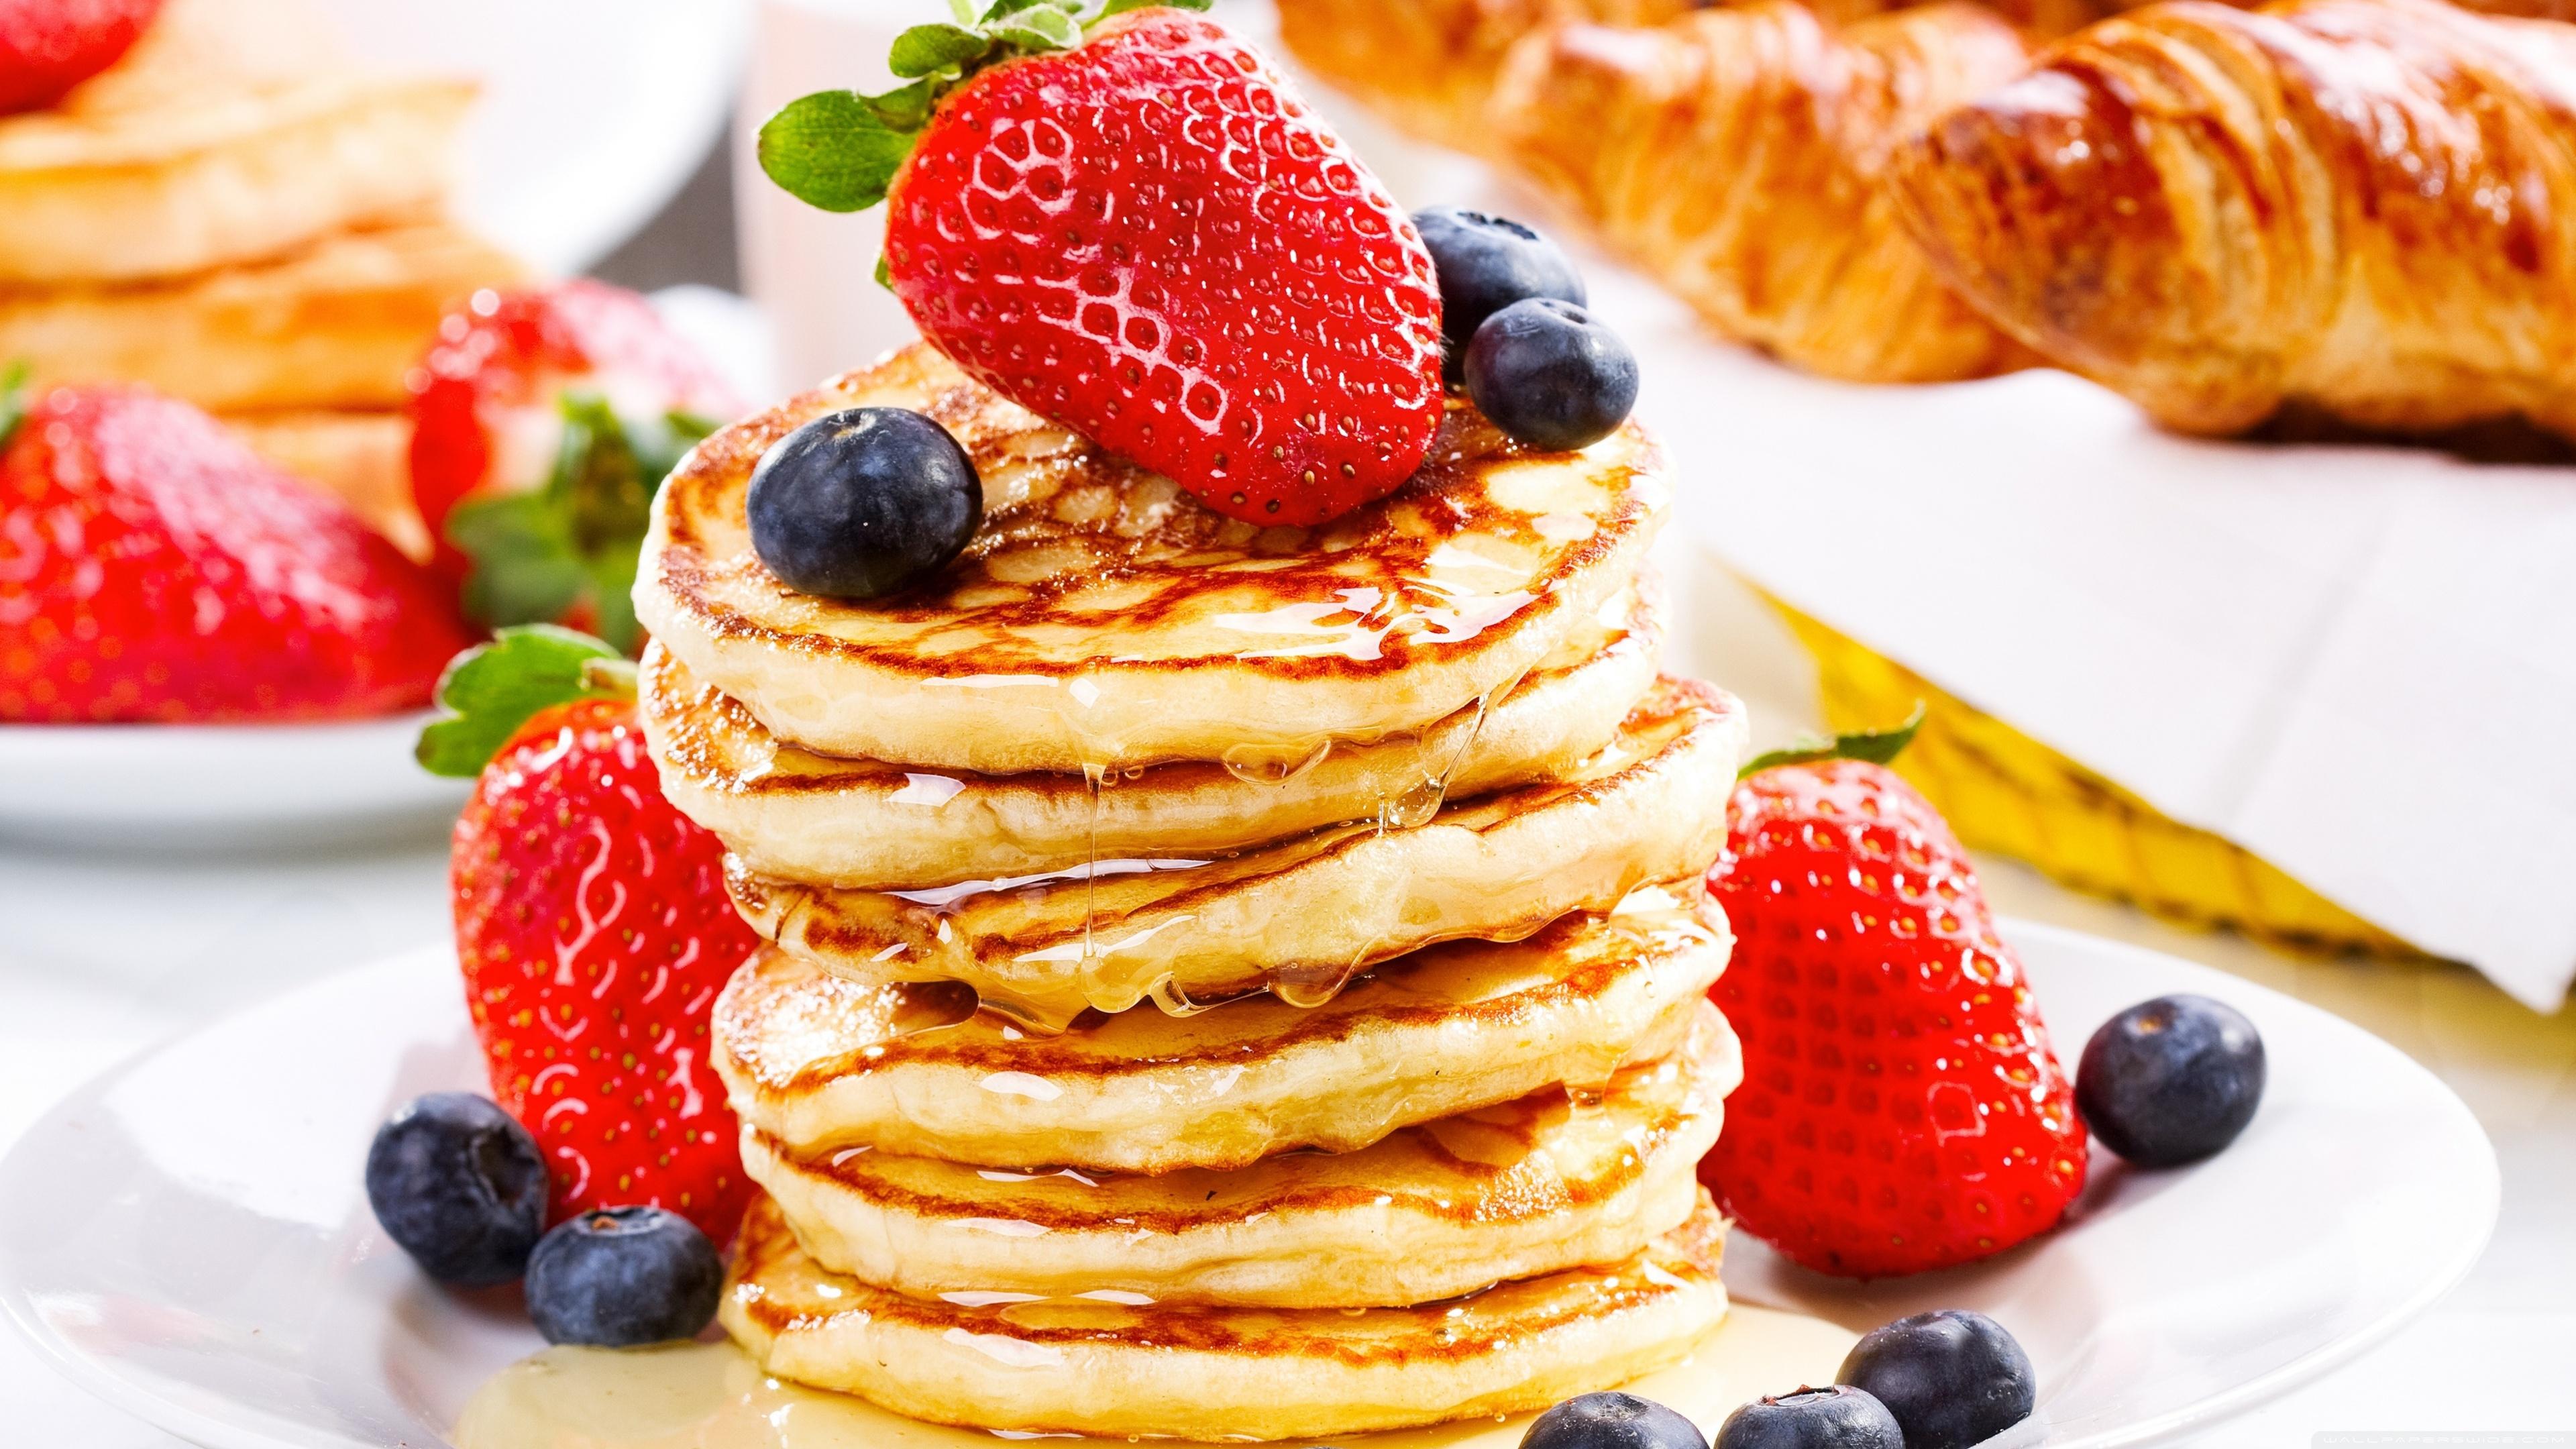 Pancakes Syrup 4K HD Desktop Wallpaper for 4K Ultra HD TV 3840x2160